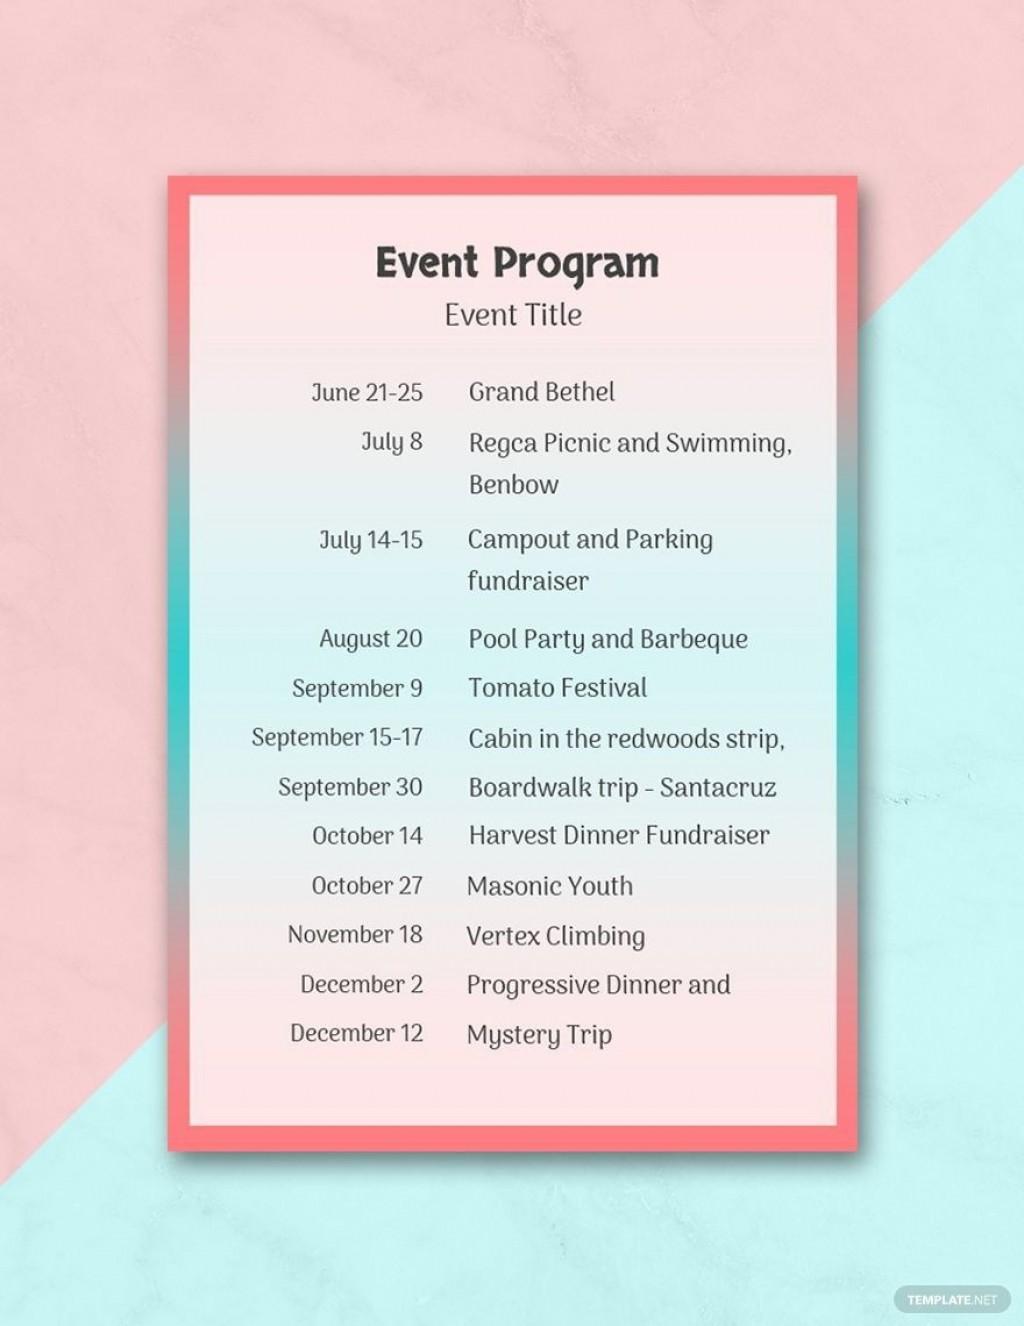 001 Impressive Printable Event Program Template Picture  Free DownloadLarge